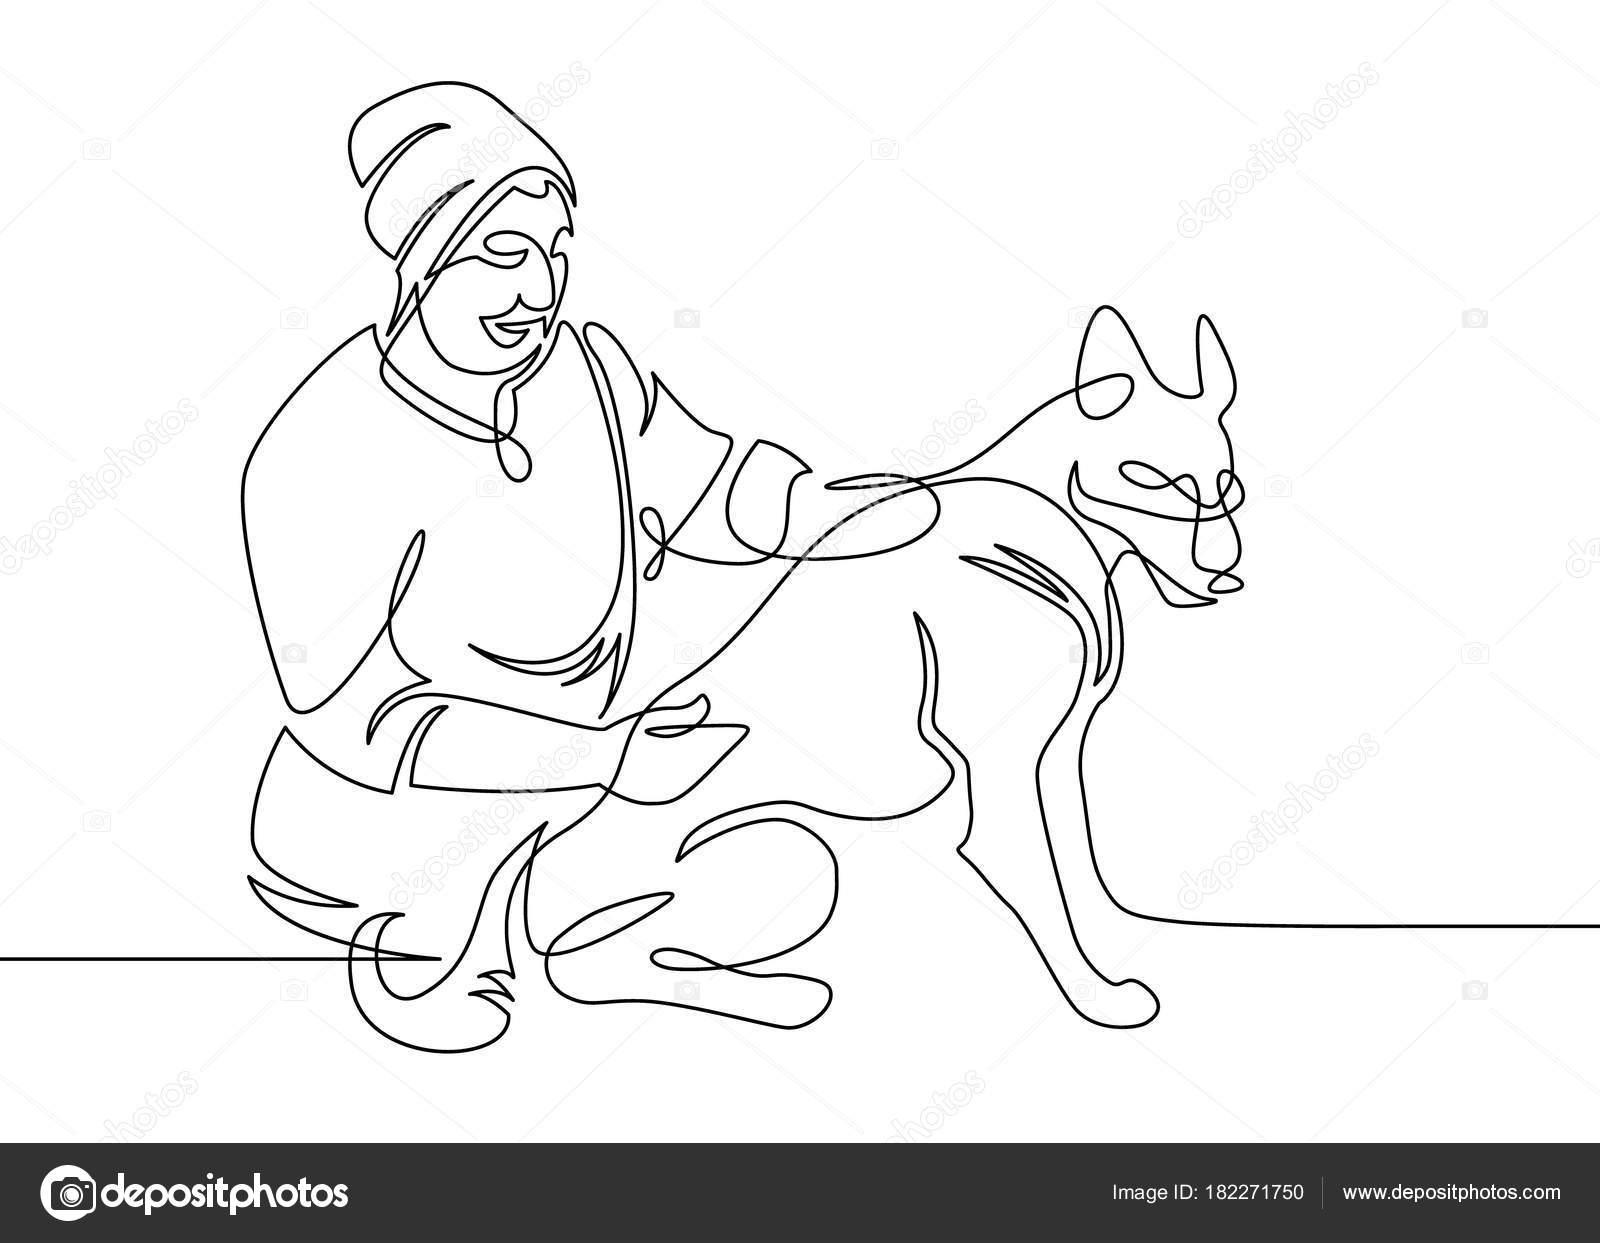 Continua un médico veterinario de línea dibujada — Vector de stock ...